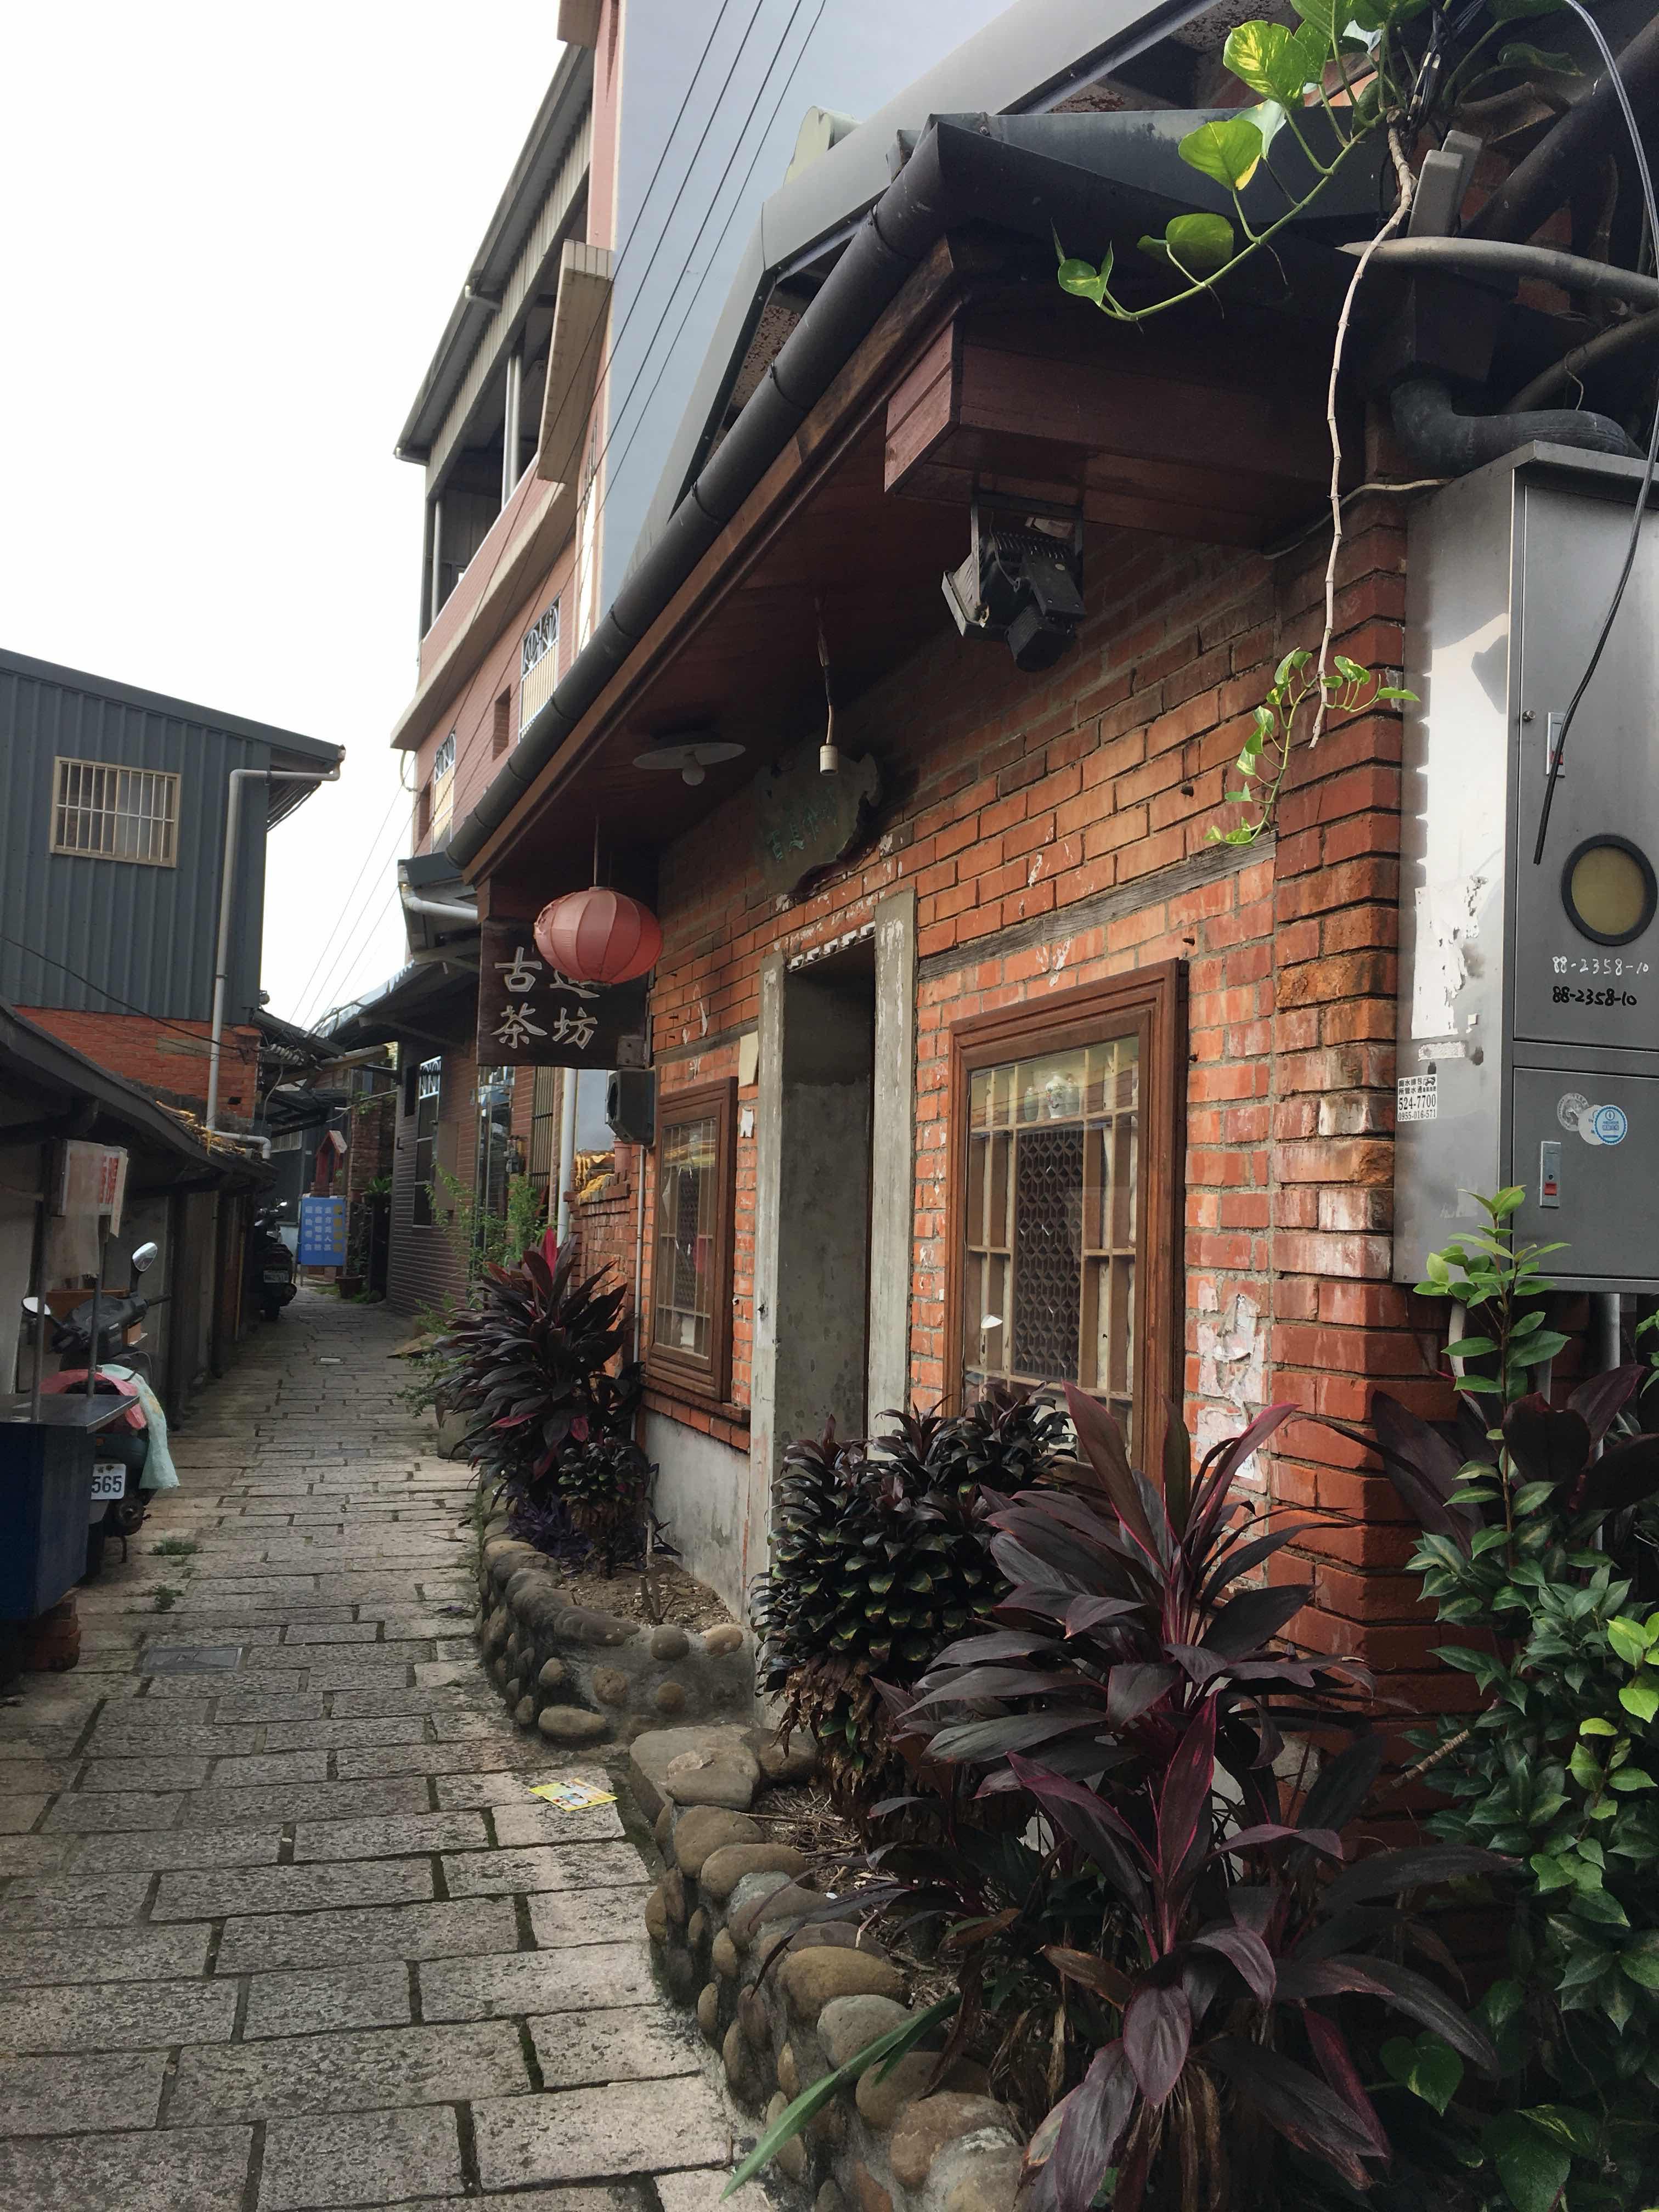 beipu old street beipu hakka culture hakka village hsinchu Taiwan